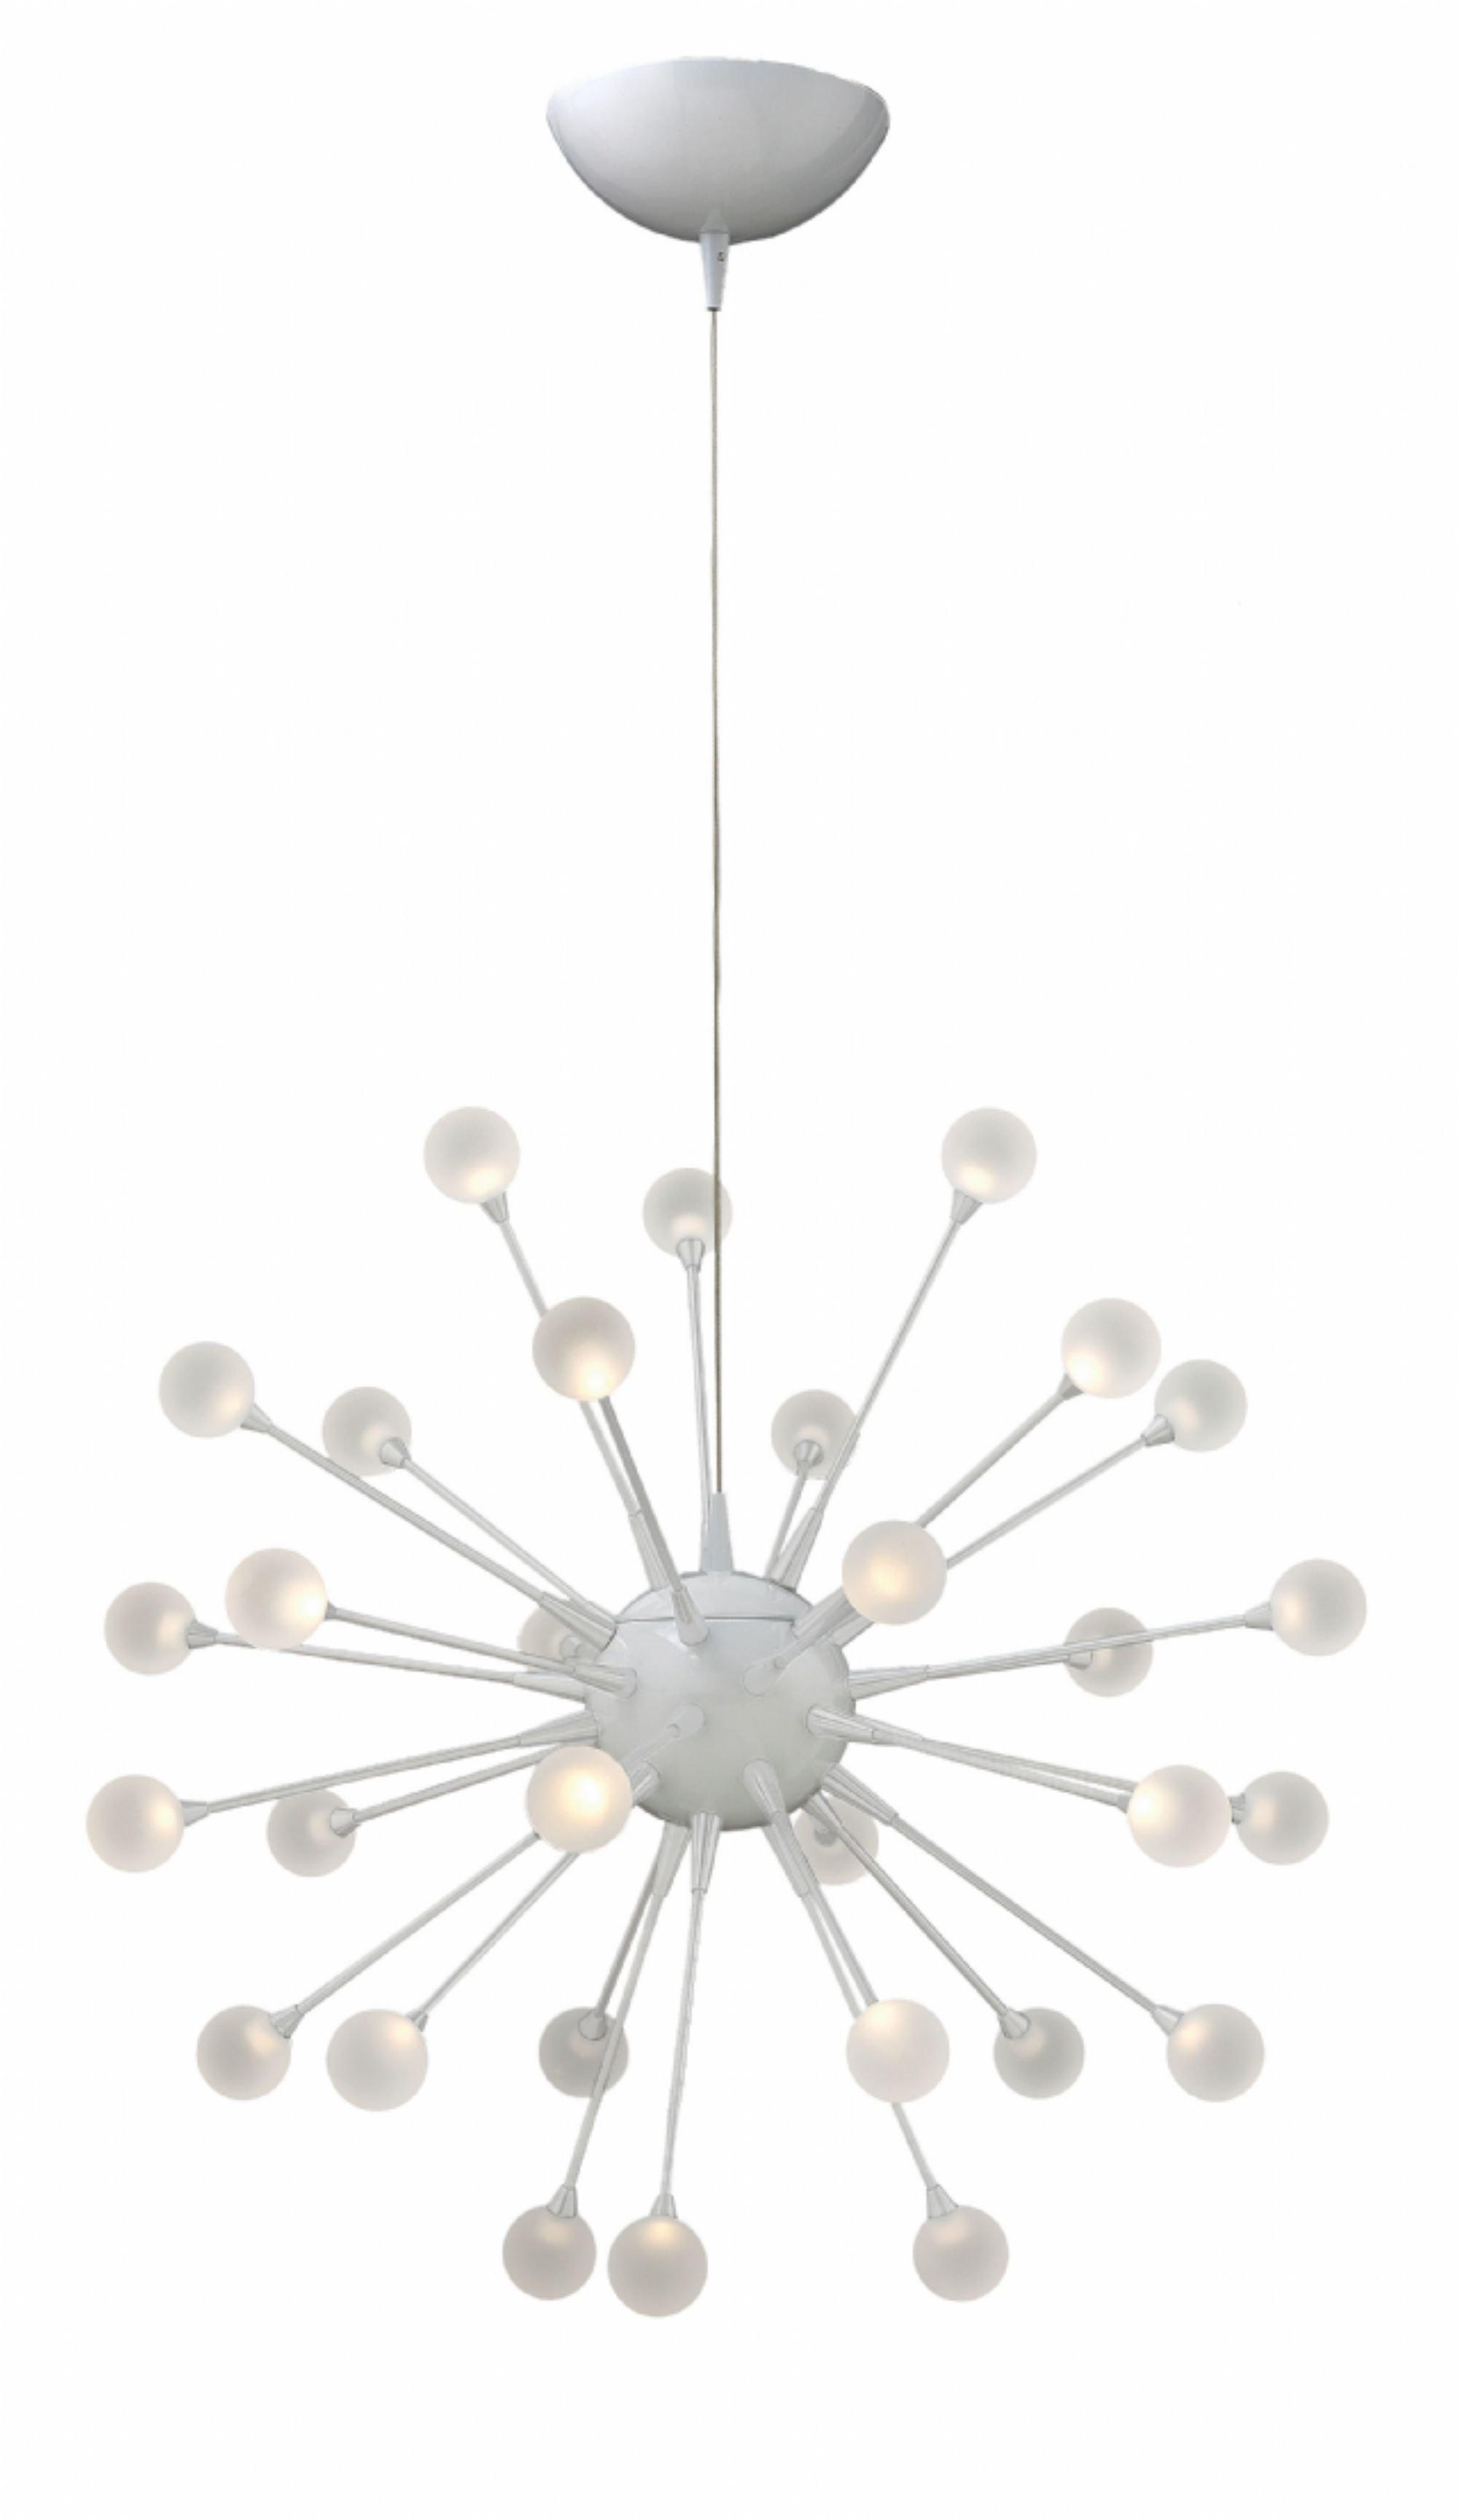 Impulse 30-Light Led Sputnik Chandelier in Silvia 6-Light Sputnik Chandeliers (Image 10 of 30)